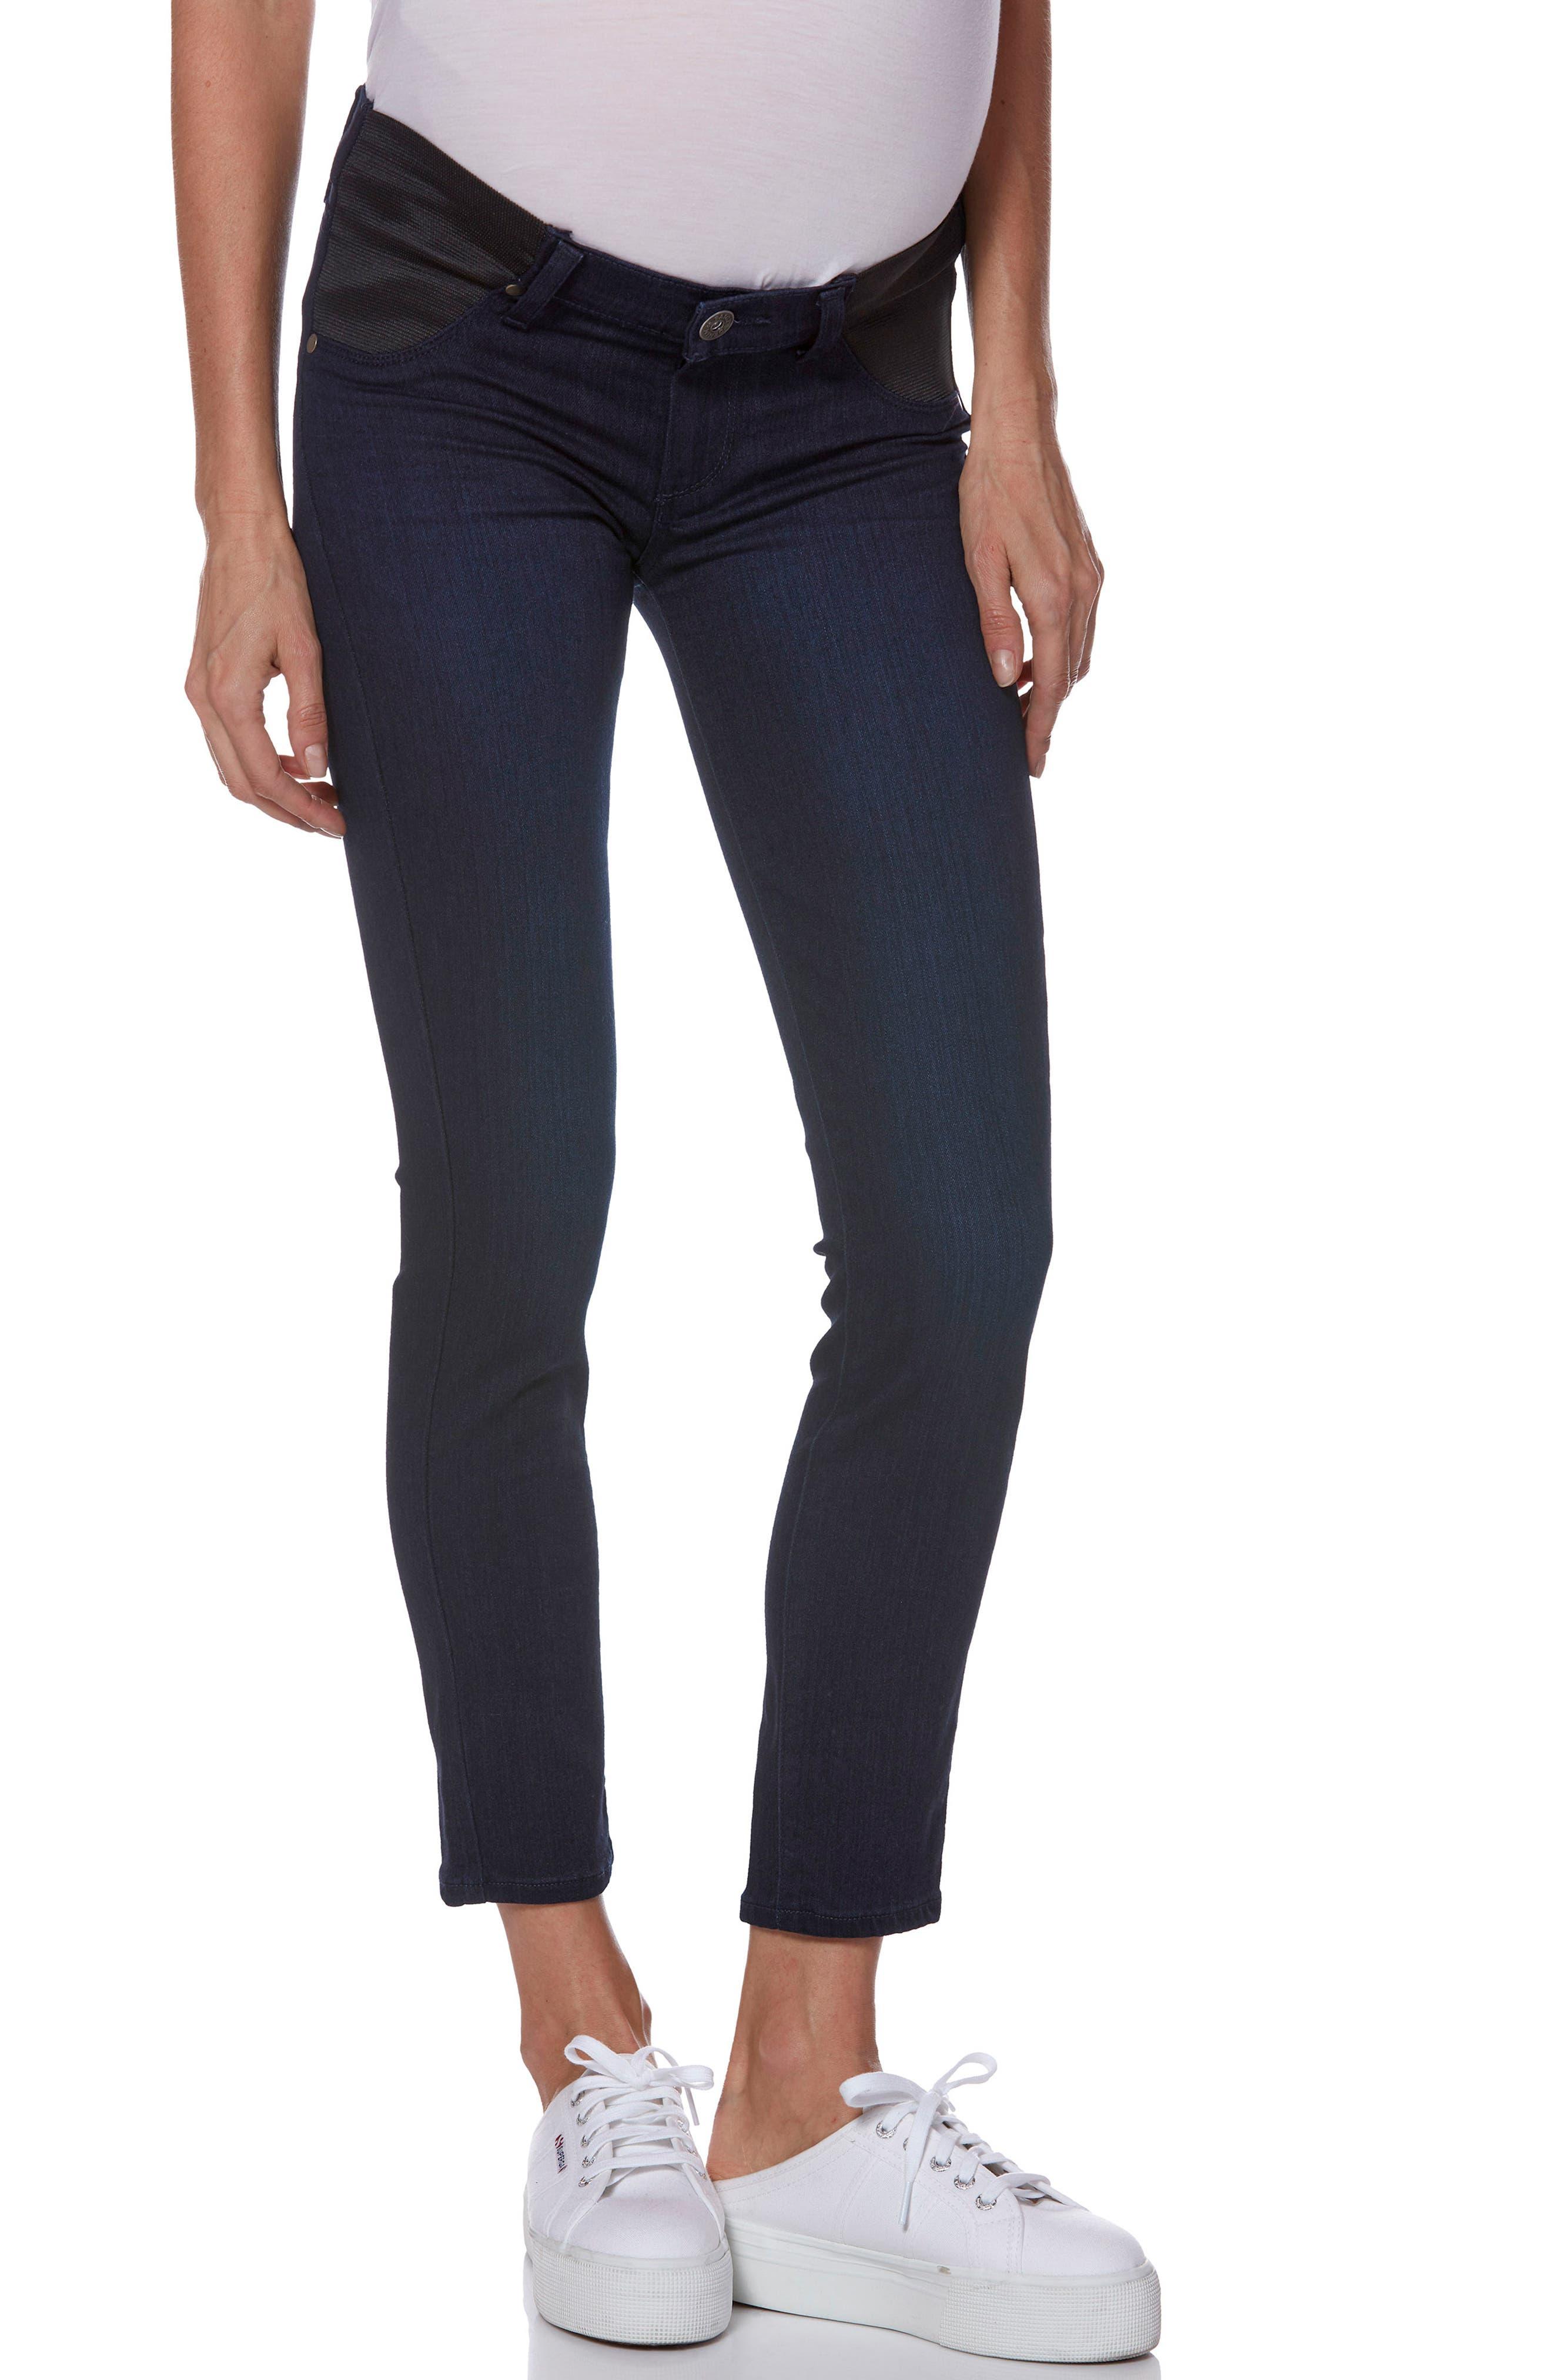 PAIGE,                             Transcend - Verdugo Ultra Skinny Maternity Jeans,                             Main thumbnail 1, color,                             LANA